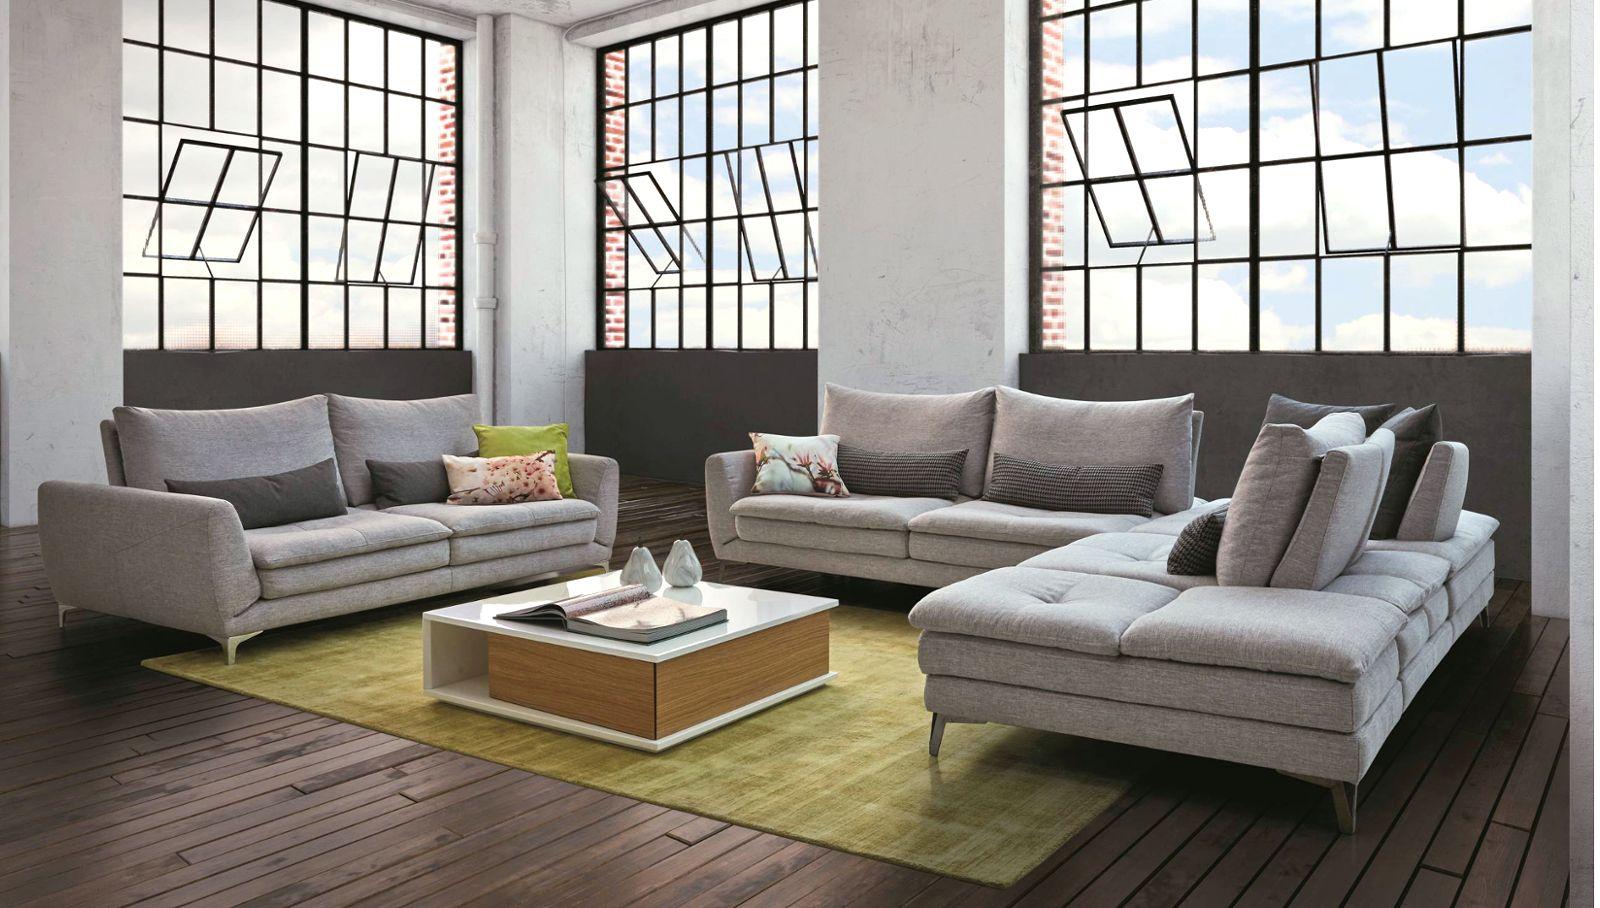 Salon Modem Canape Design Meuble Design Mobilier Design